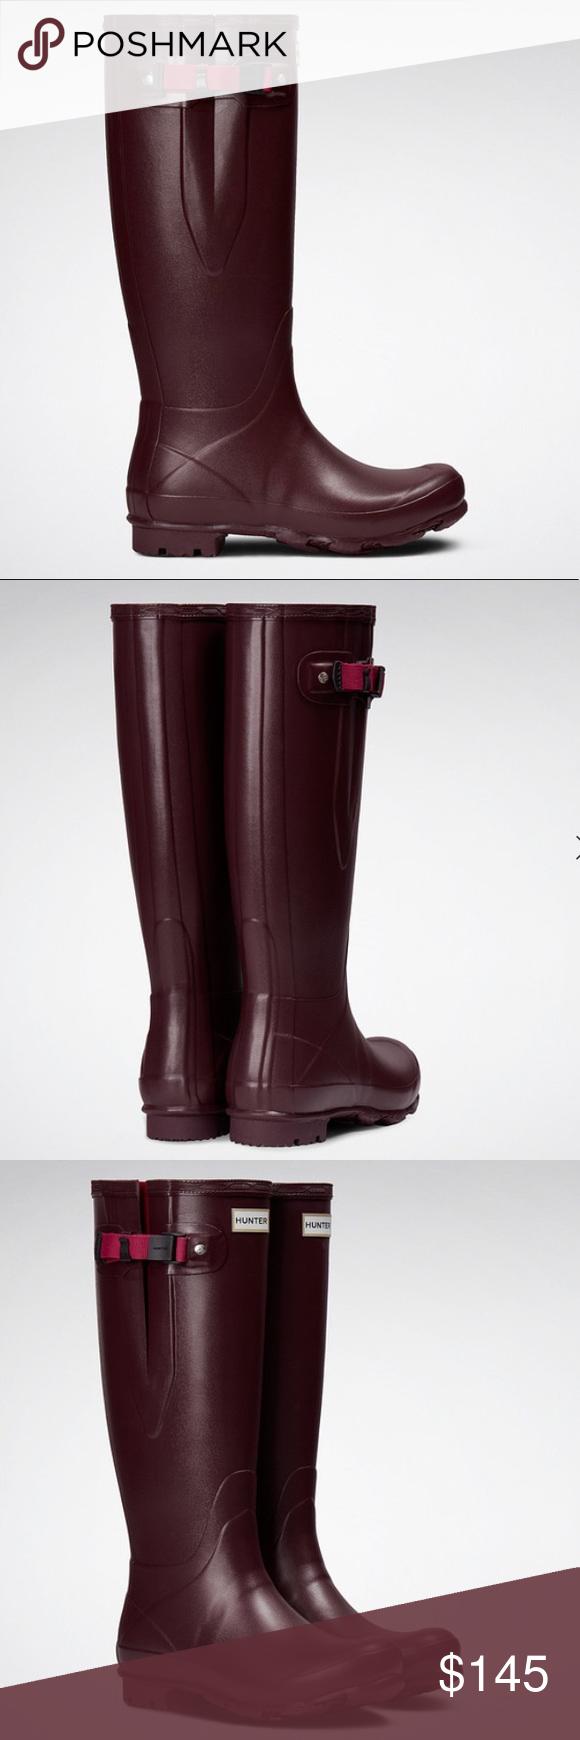 aa9f39a7929 Brand hunter Norris field Rain Boots New in box US size 9, euro 40 ...